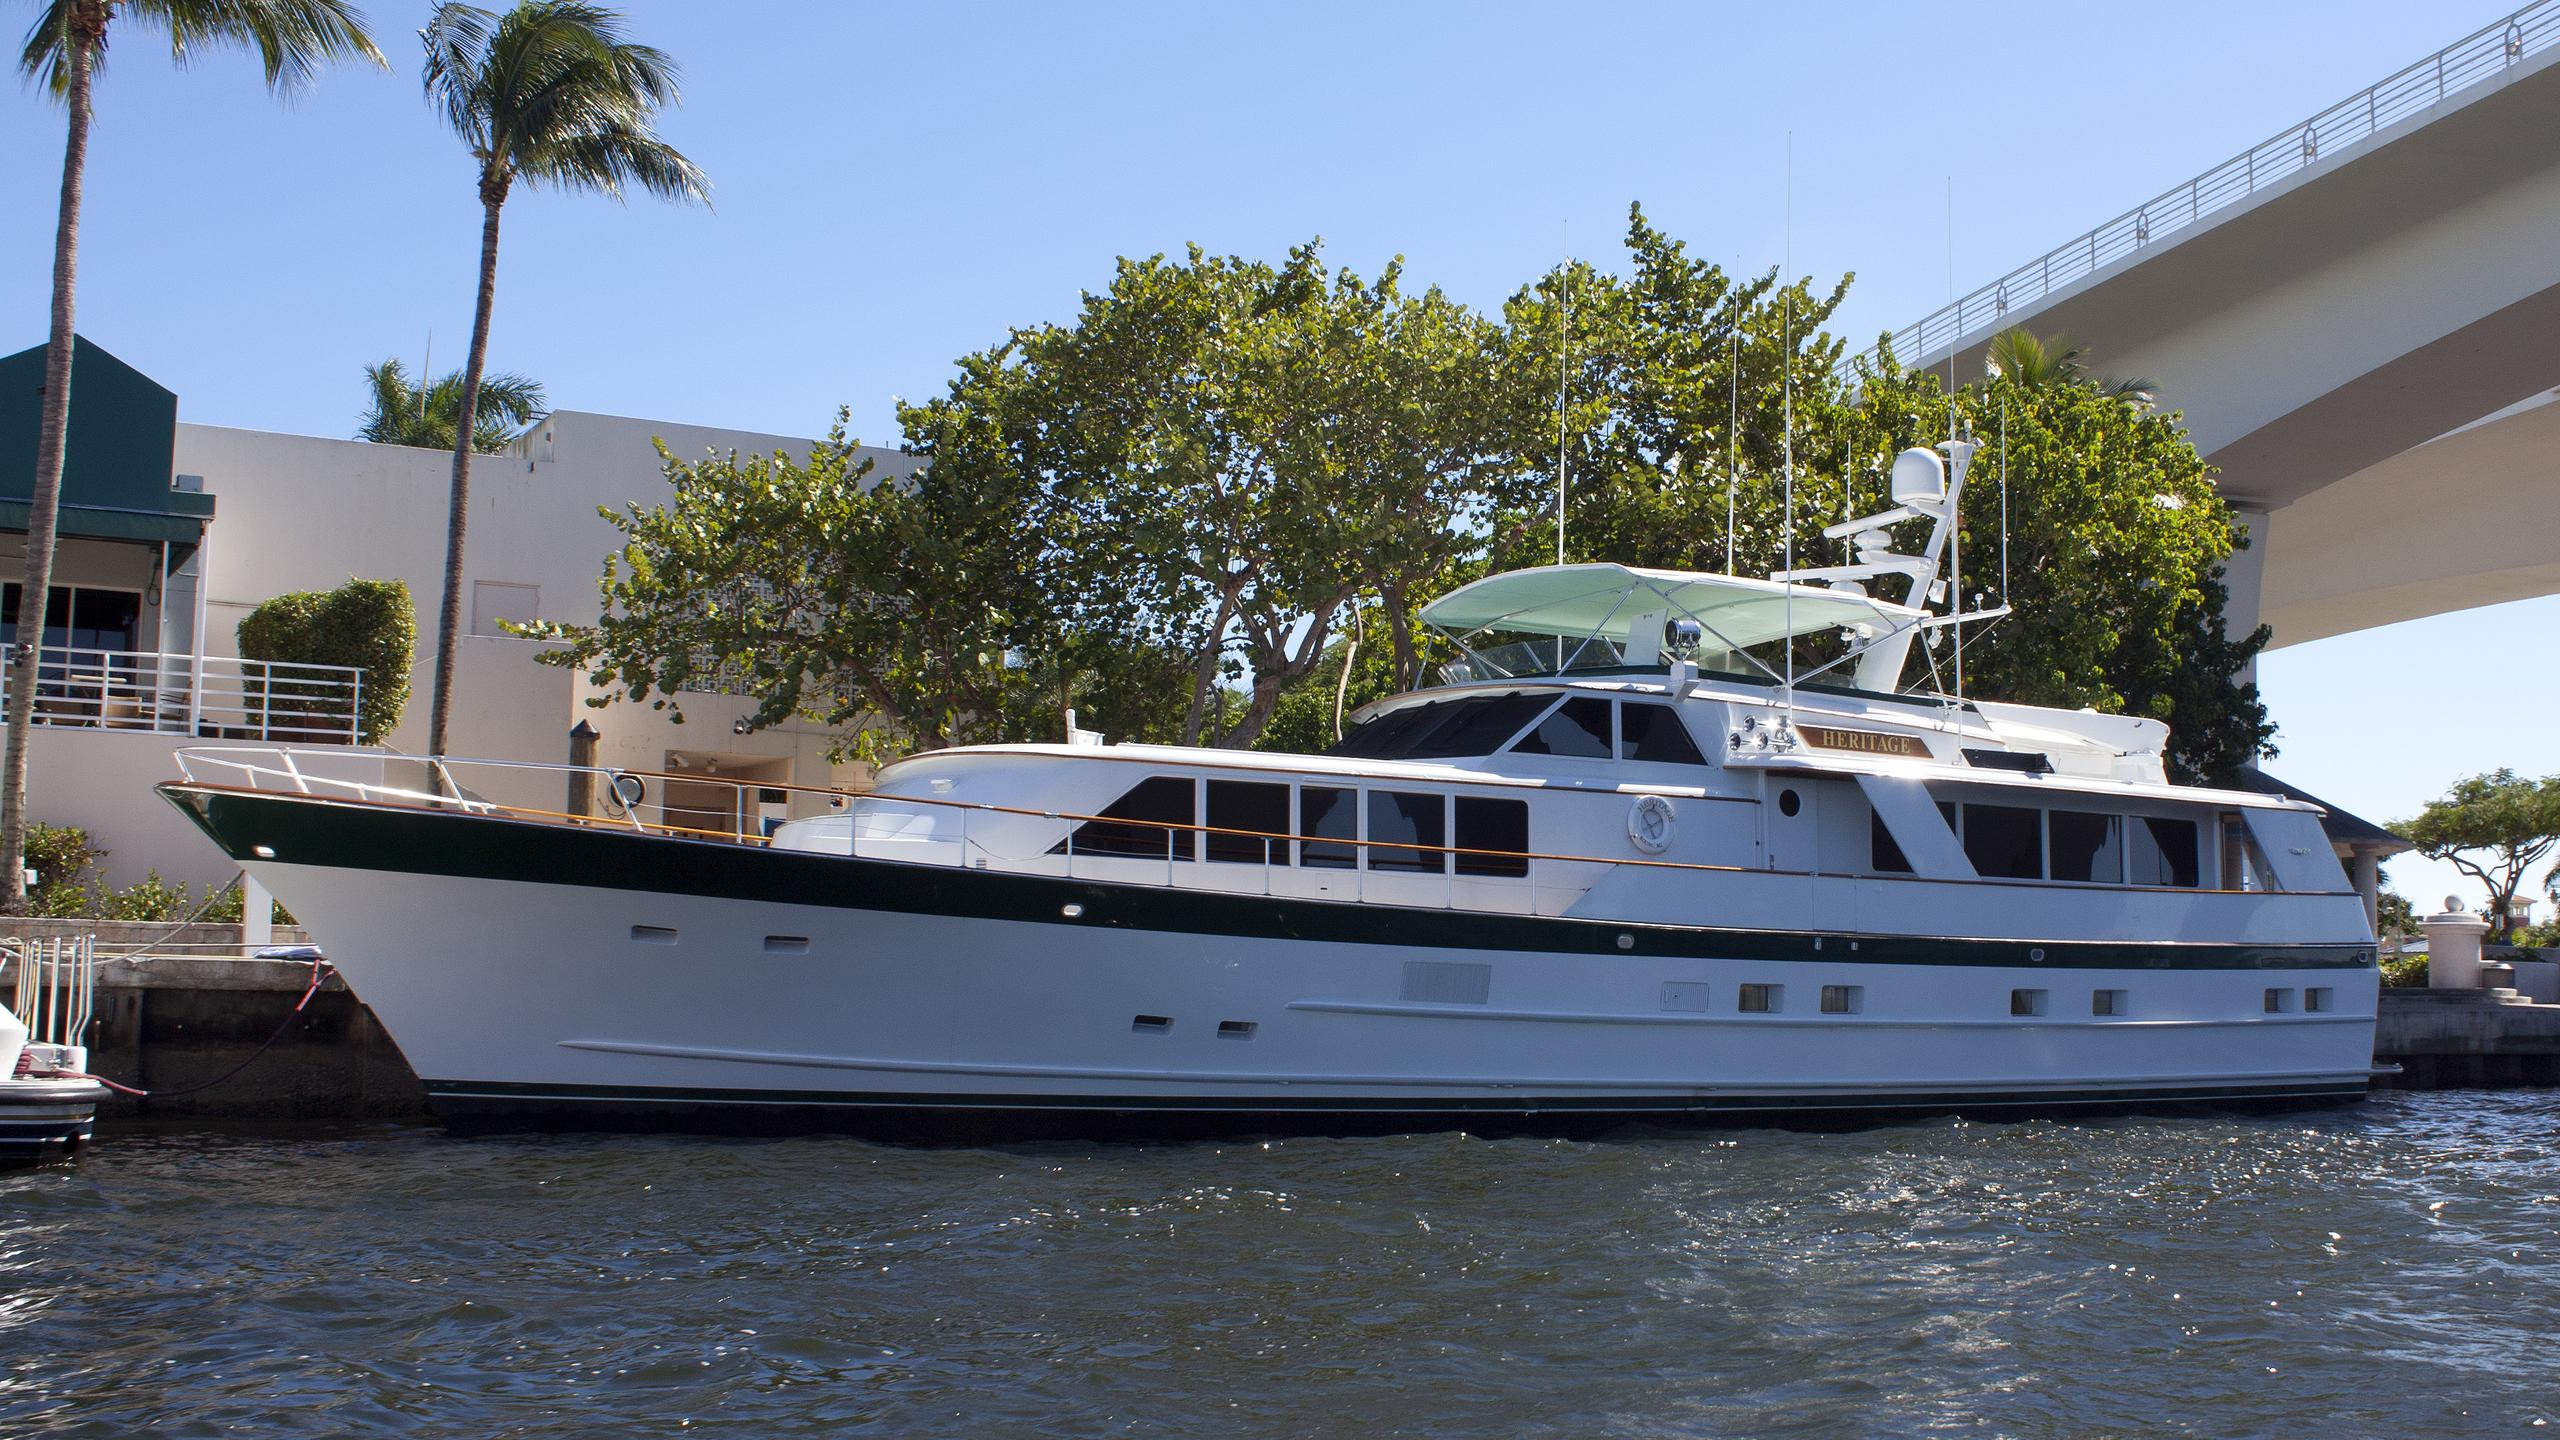 heritage motoryacht burger boat 1987 27m profile